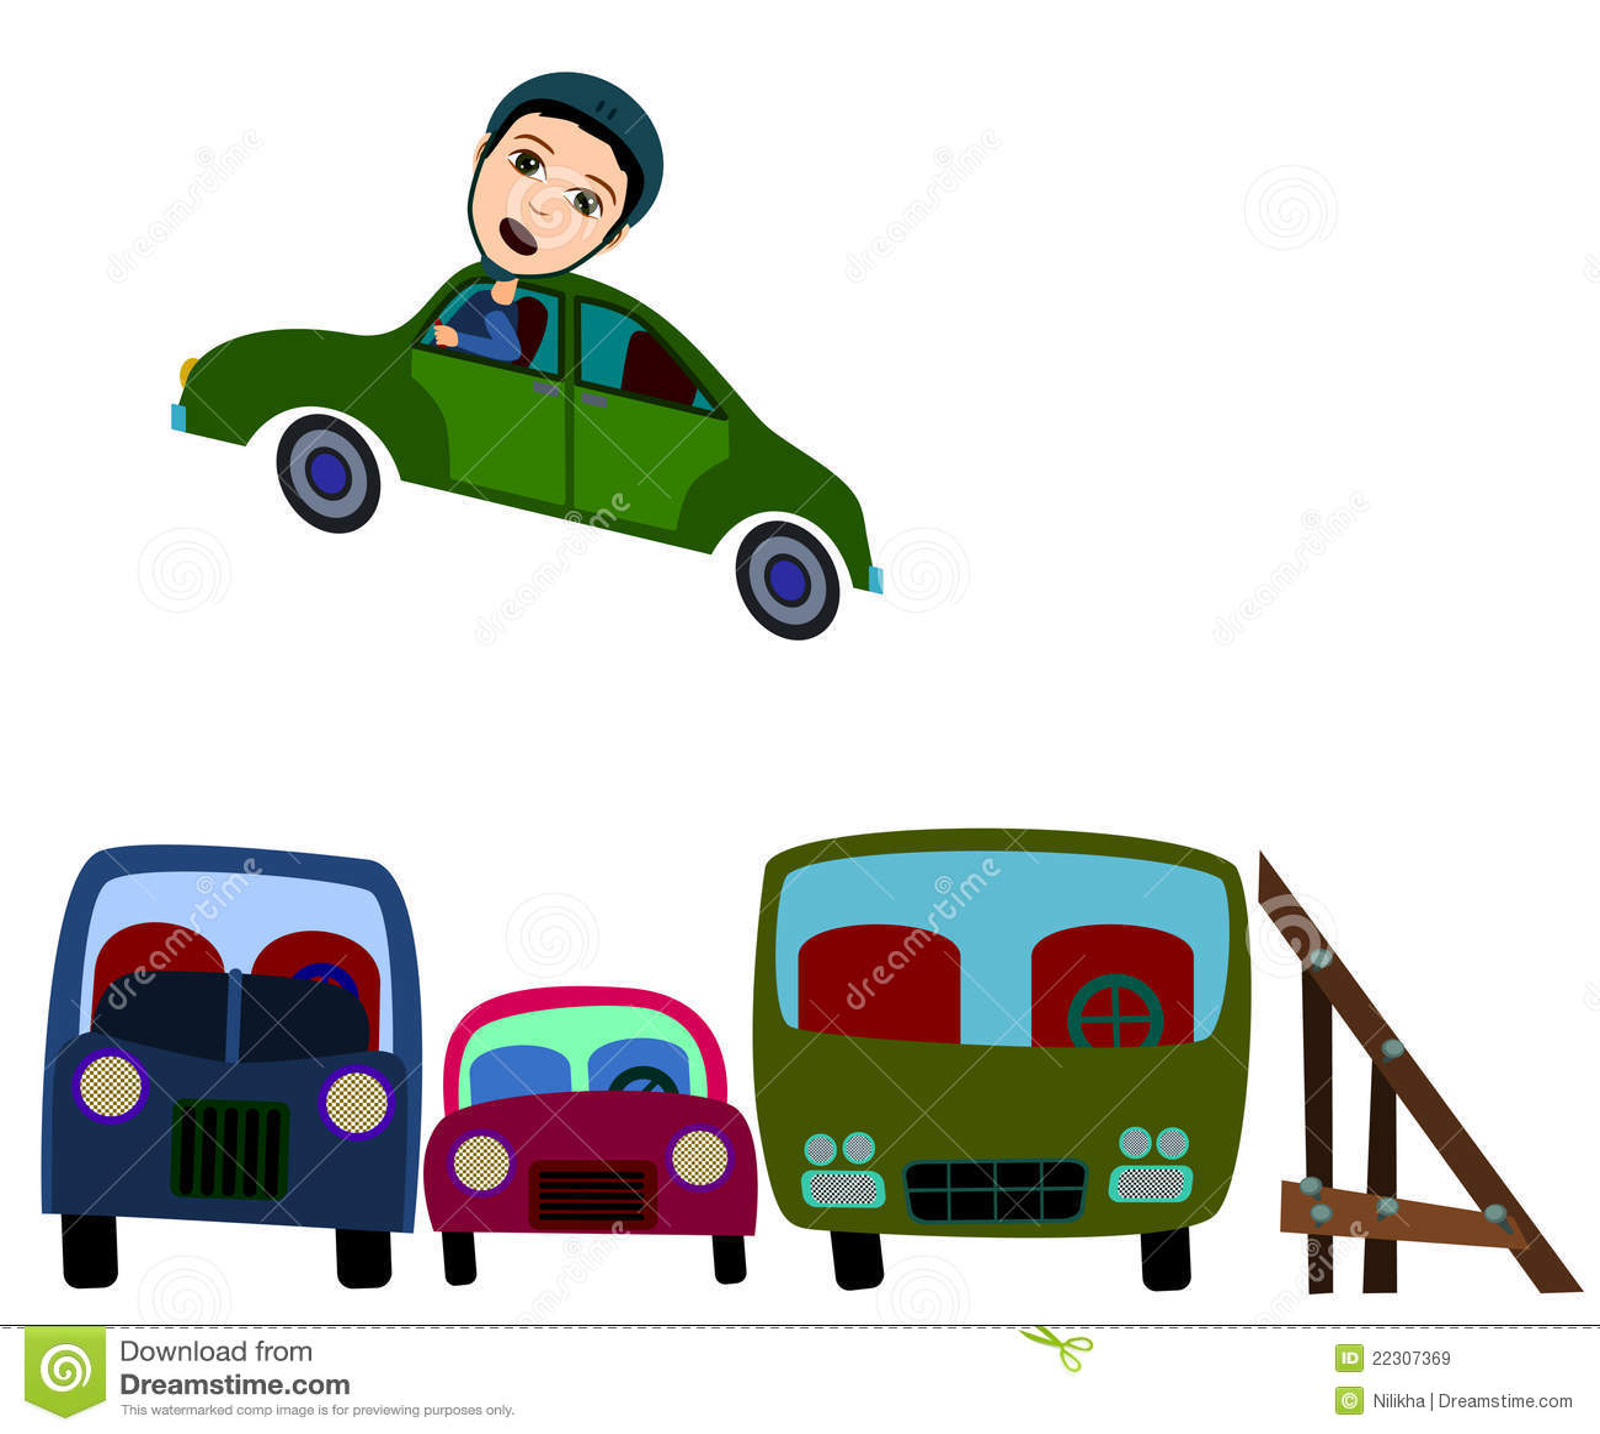 Car Jump Stock Illustration. Image Of Adventure, Brave